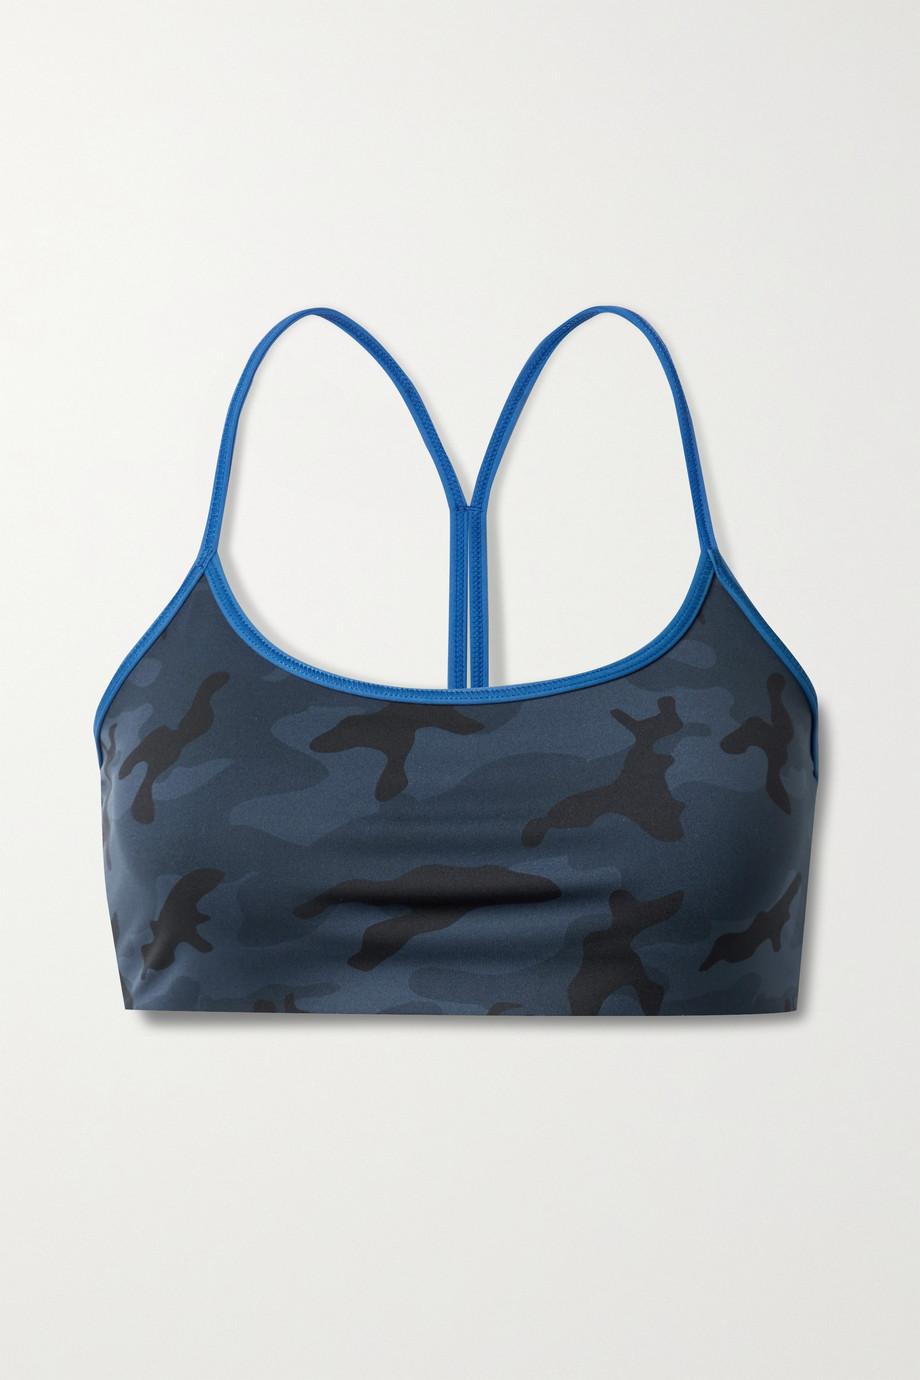 All Access Chorus camouflage-print stretch sports bra